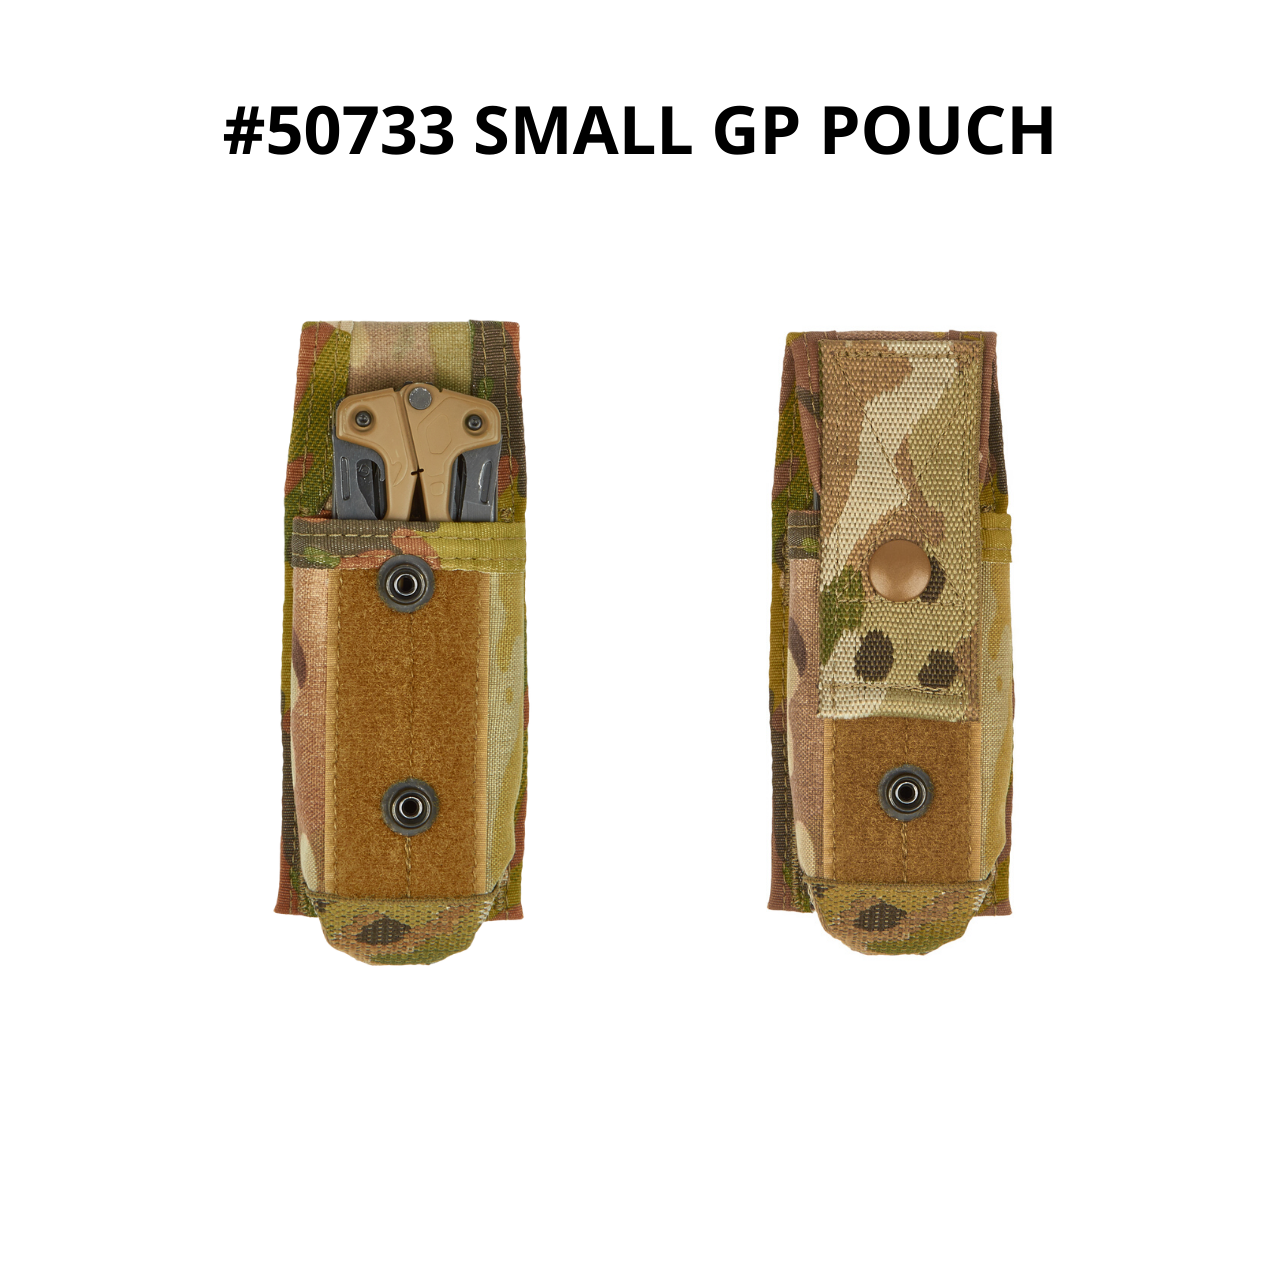 50733 small general purpose pouch